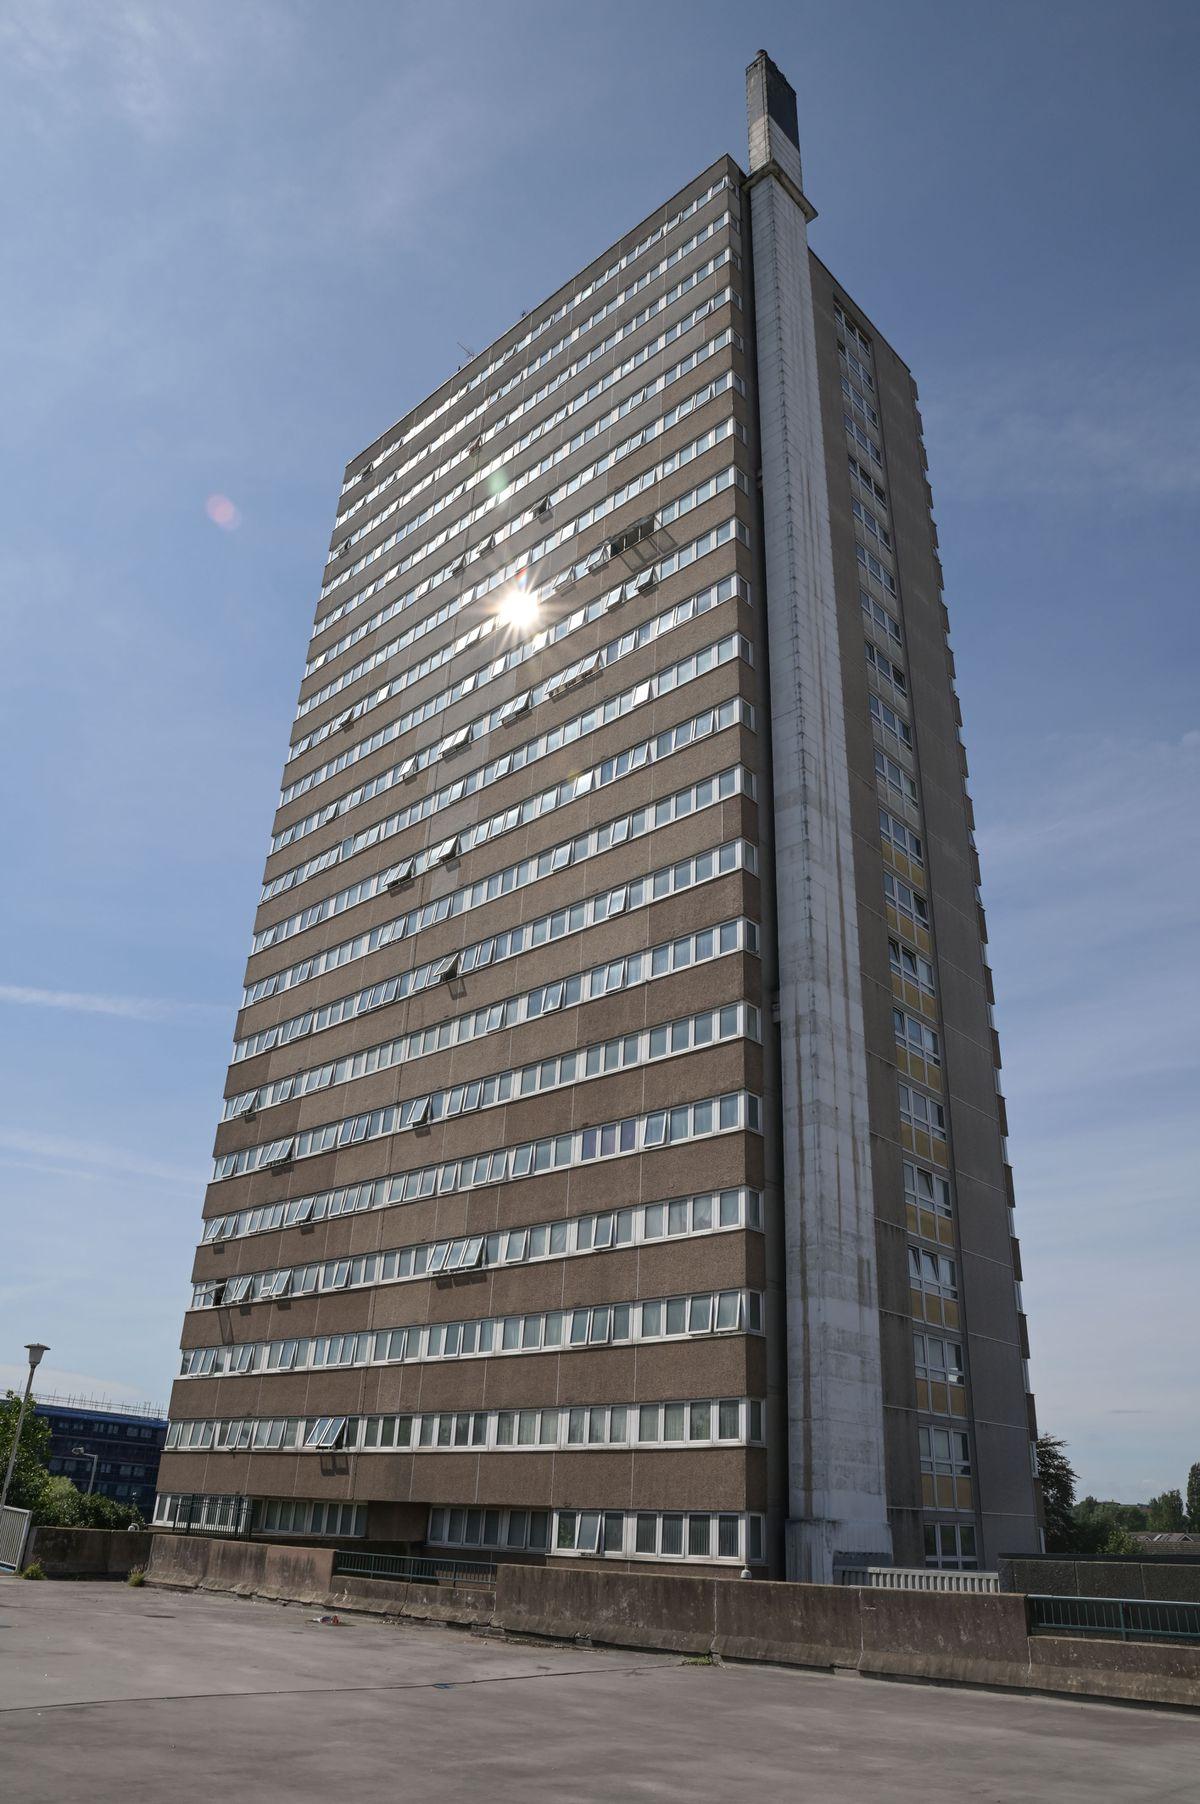 Jomaa Jerrare's last known address was at Hampton View flats in Heath Town, Wolverhampton